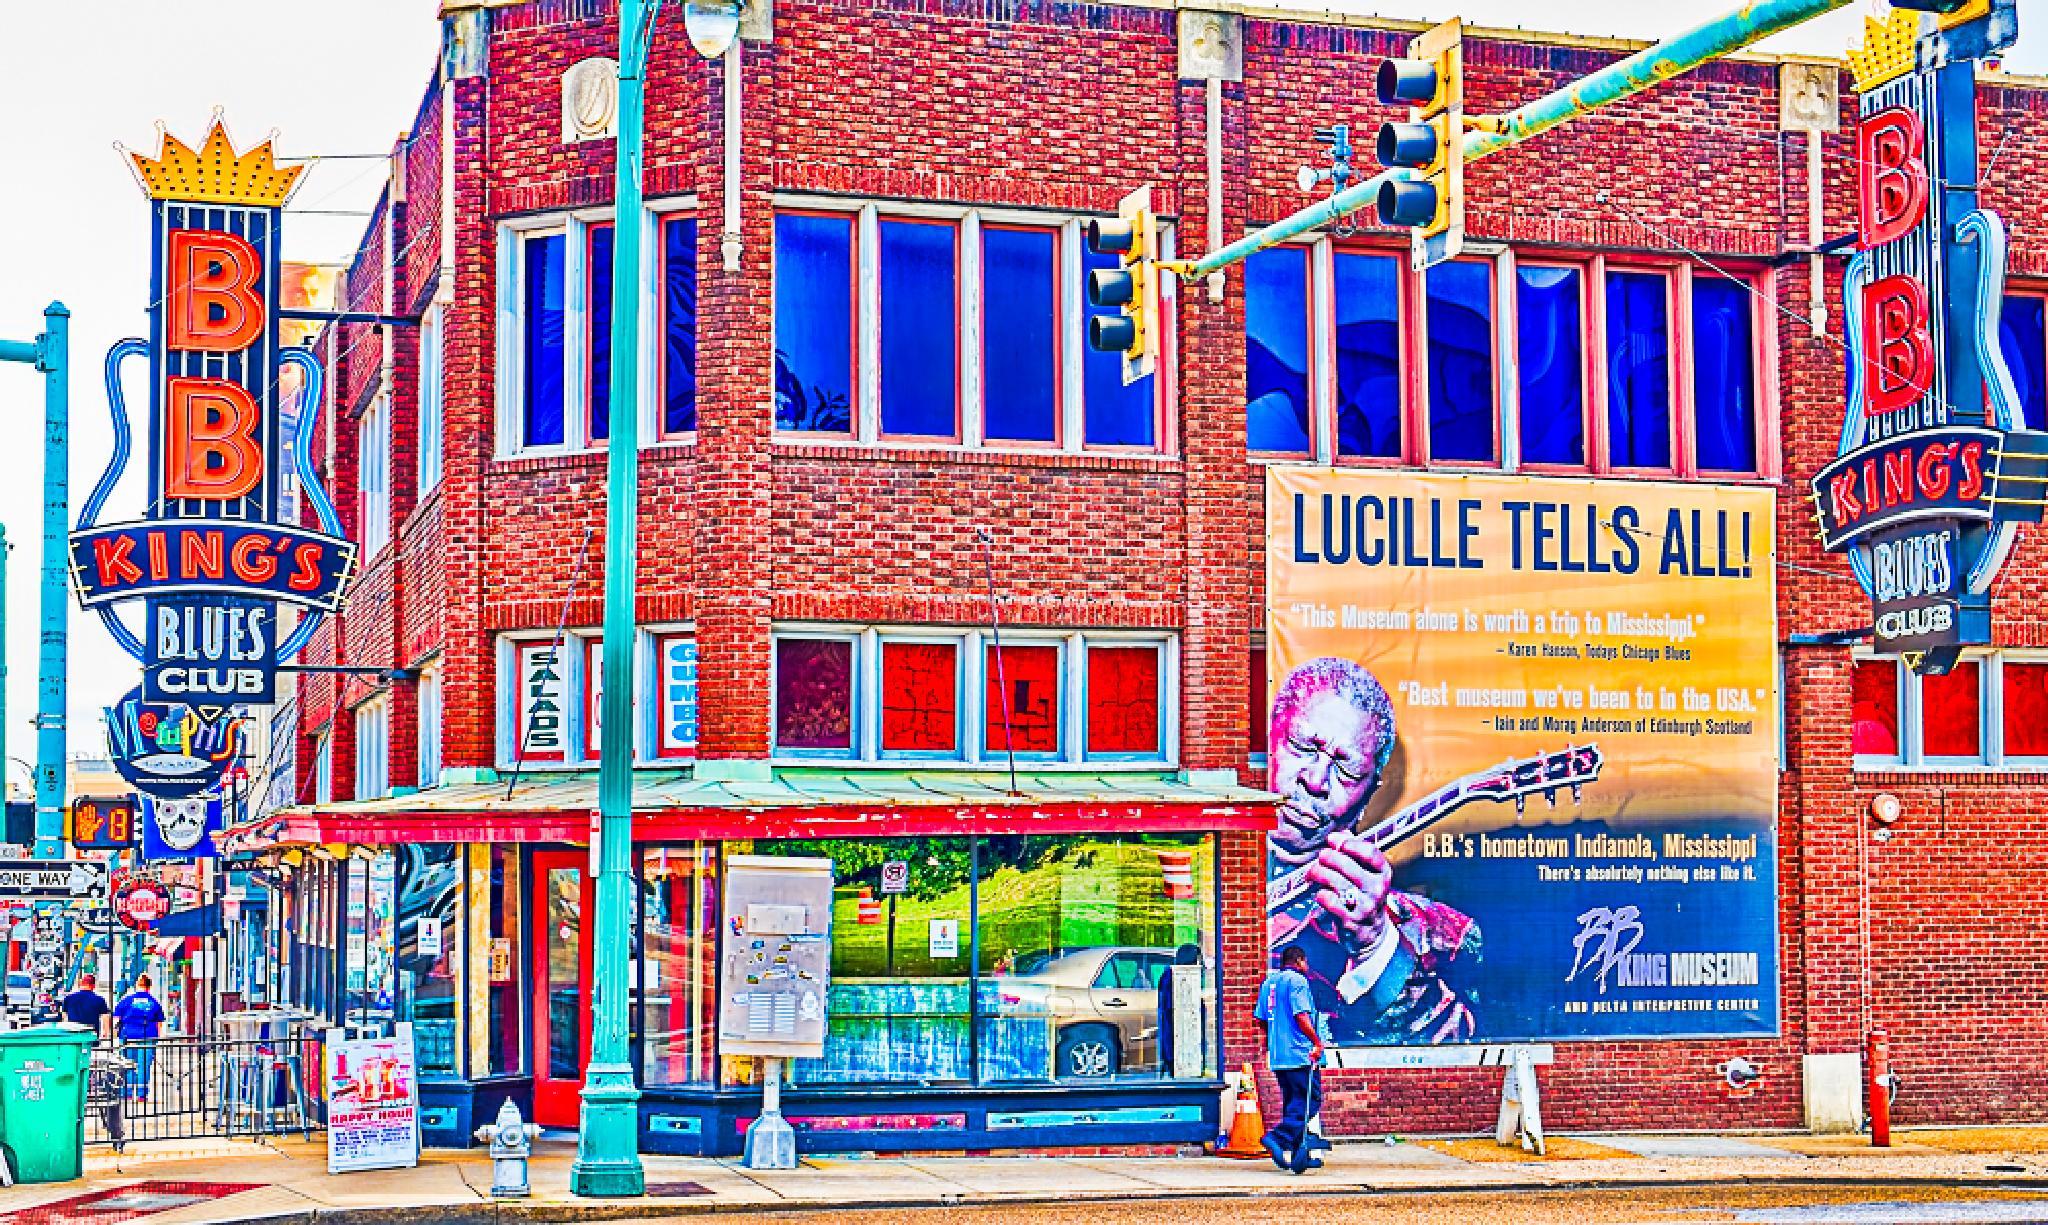 Beale Street, Scene 2 by Cliff C Morris Jr